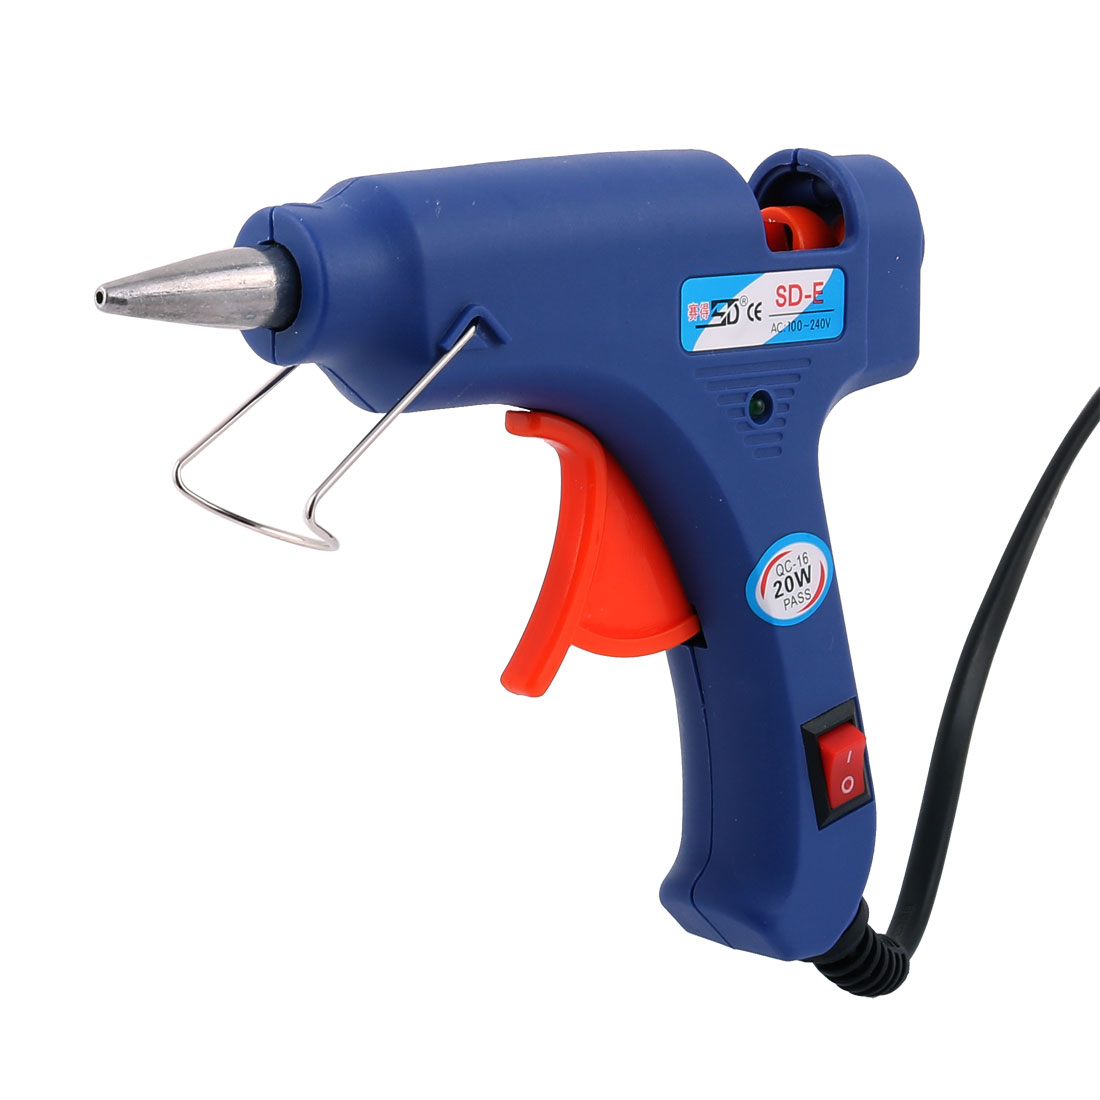 Unique Bargains Electric Heating Hot Melt Sticks Trigger Glue Gun AC 100-240V 20W w Glue Sticks by Unique-Bargains